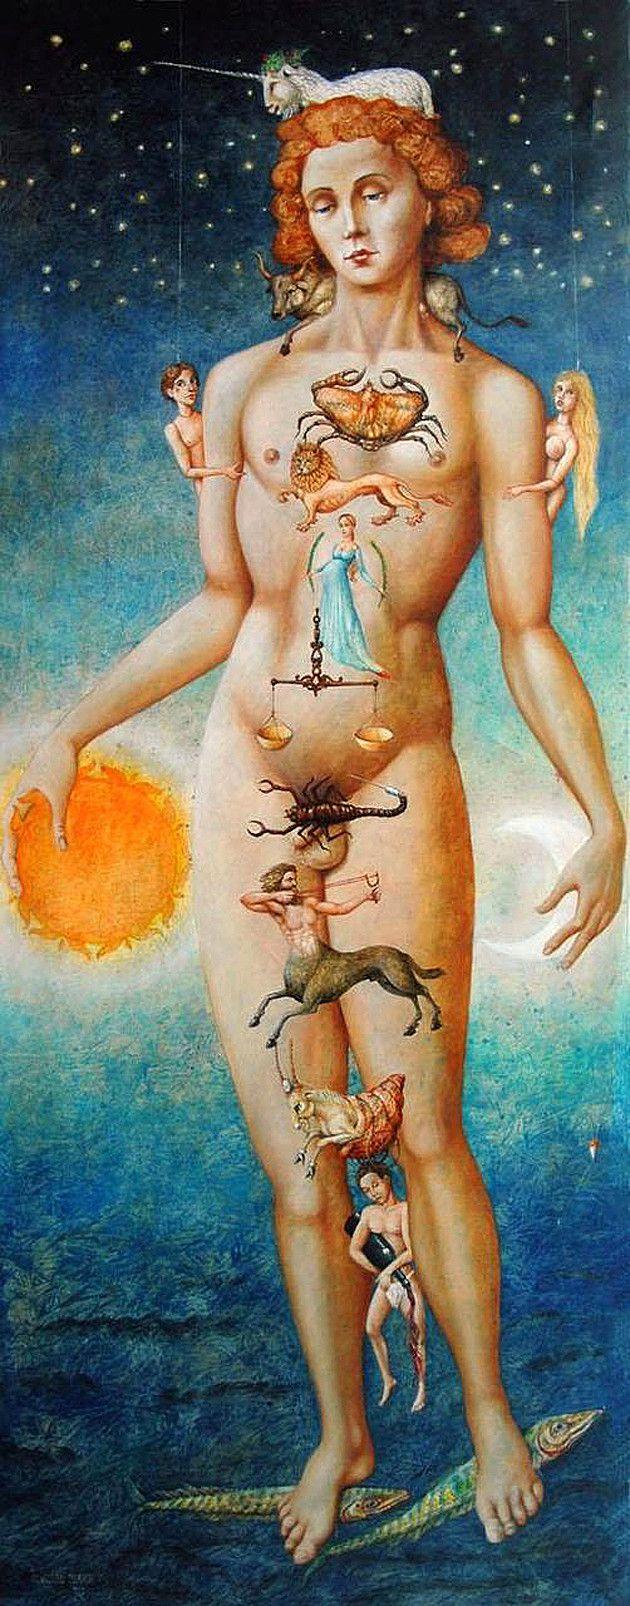 Read your Free Daily Astrology Horoscope on my blog! Click through! howtobehippy.com #astrology #free #horoscope #freehoroscopes #dailyastrology #zodiac #astrologysigns #pisces #virgo #capricorn #taurus #cancer #aries #sagittarius #leo #scorpio #aquarius #gemini #libra